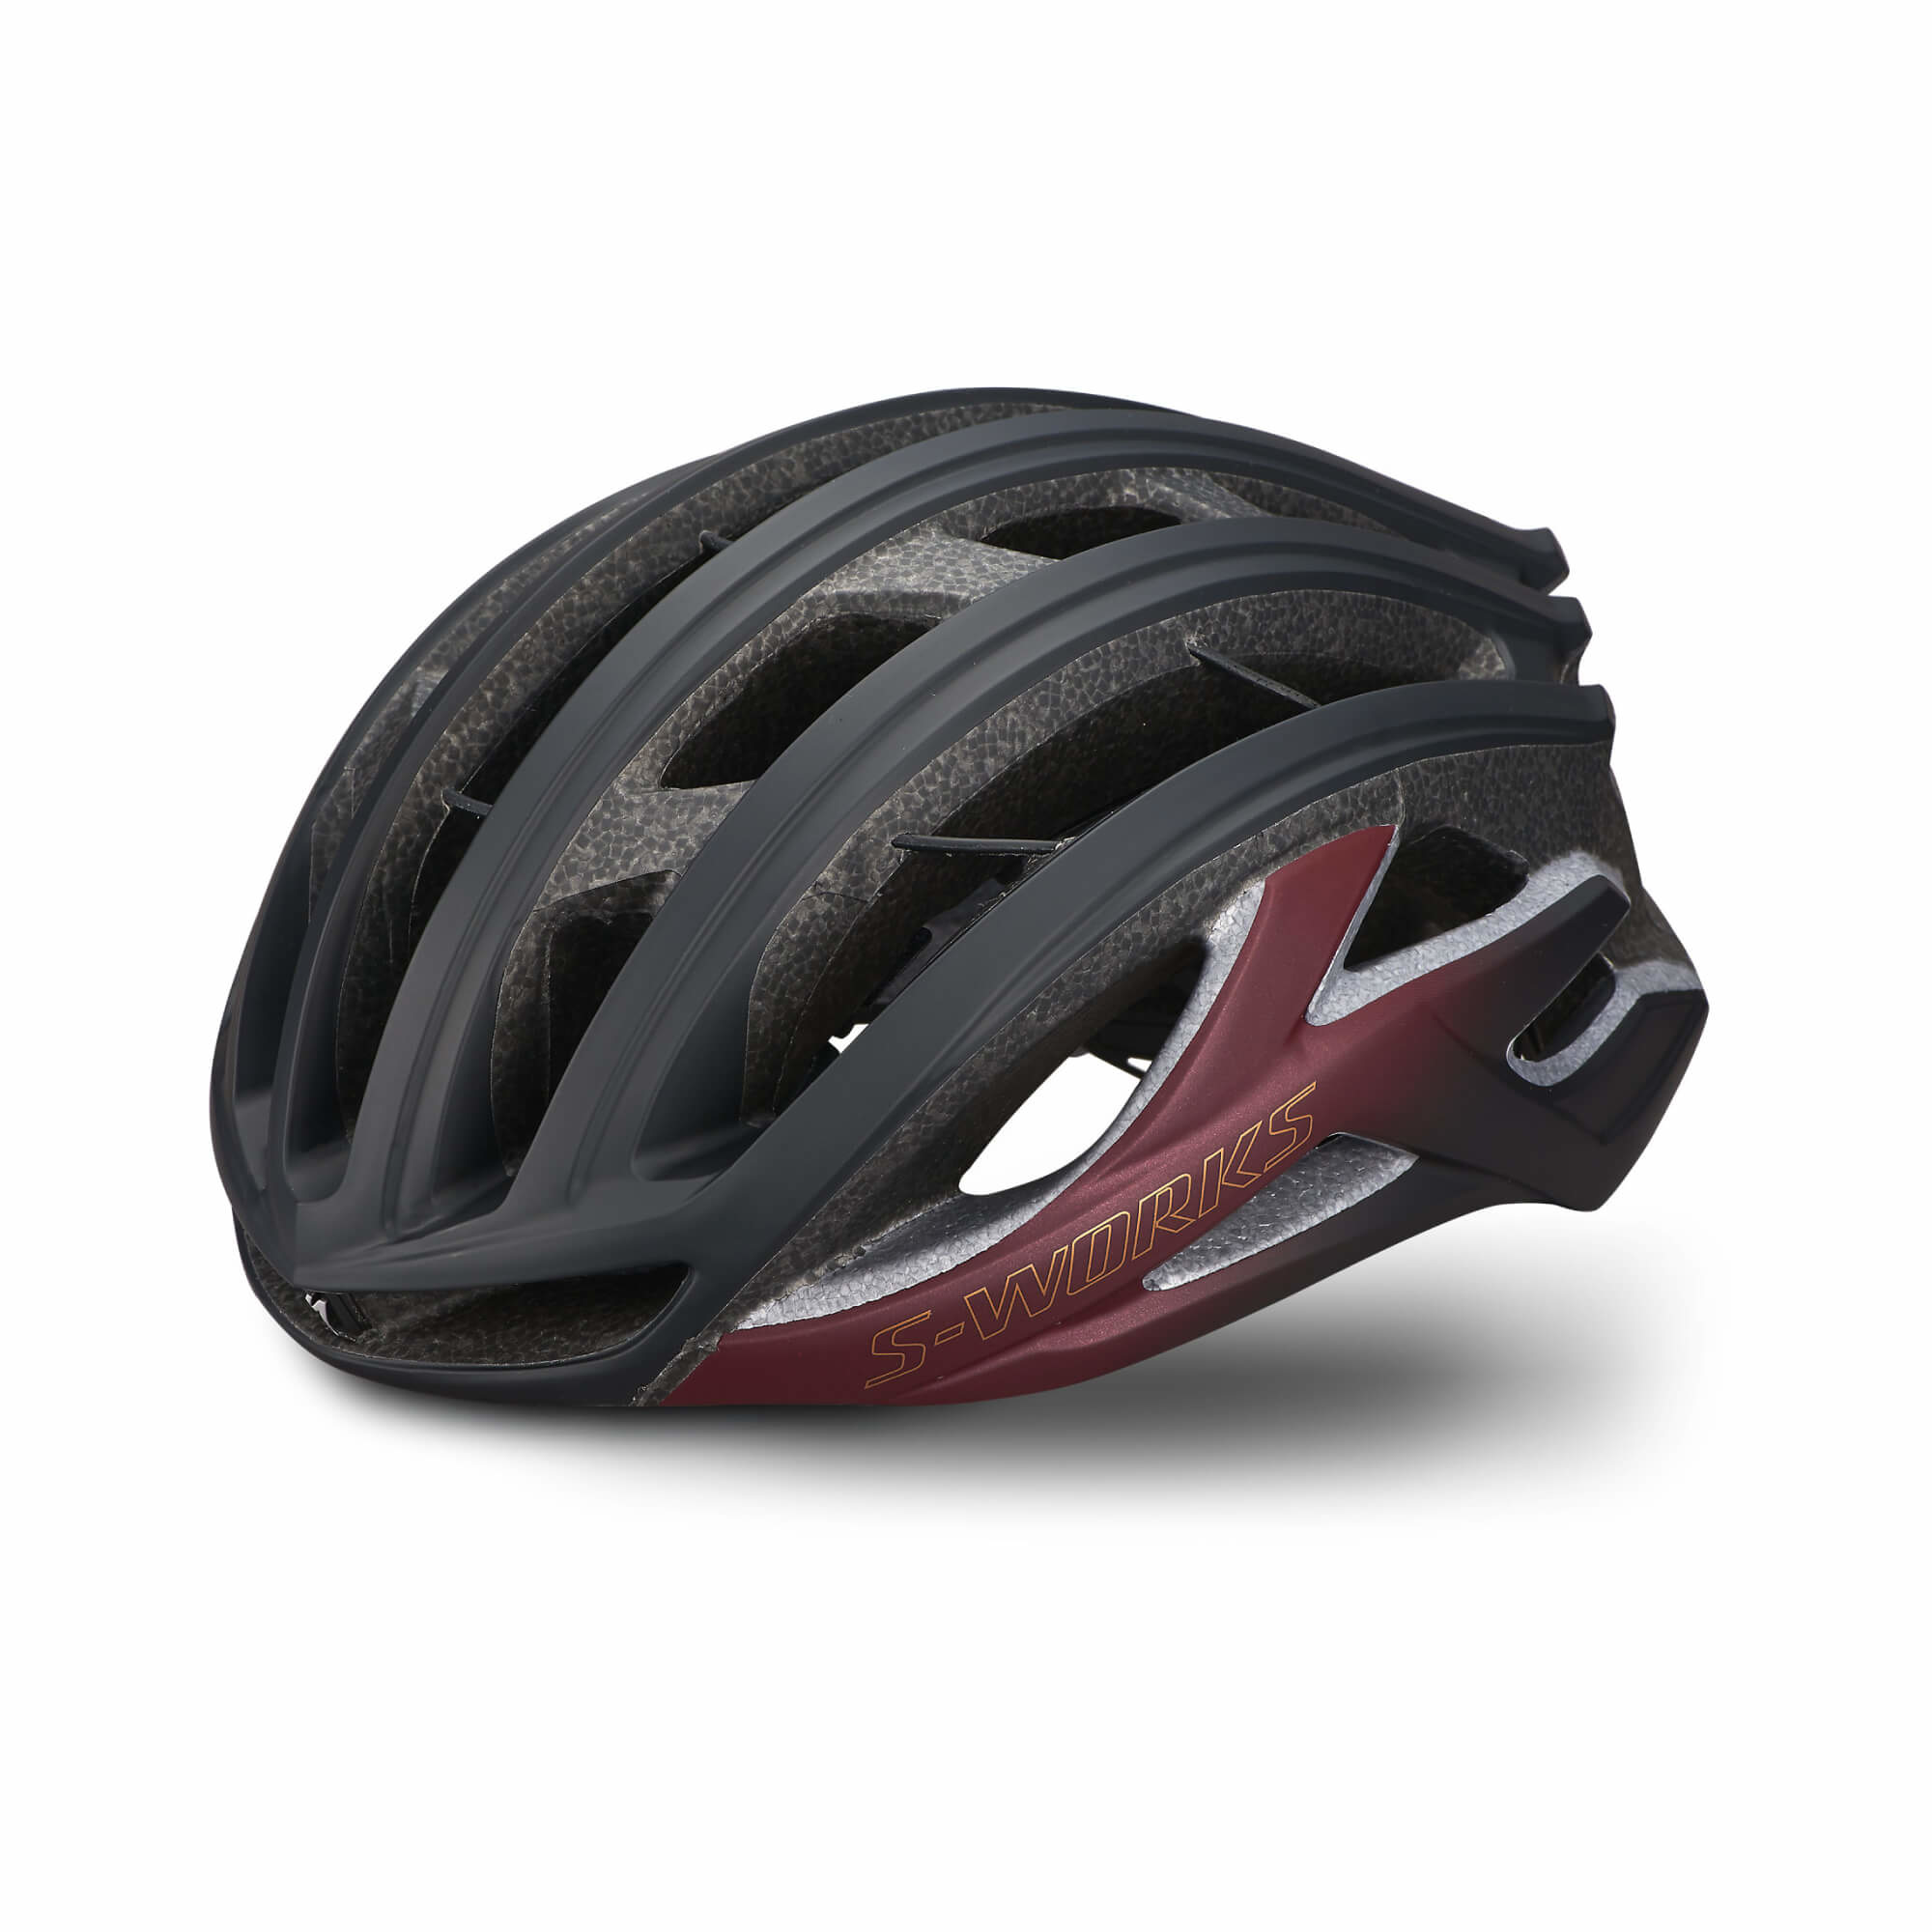 S-Works Prevail II Vent Helmet Angi Mips 2021-1